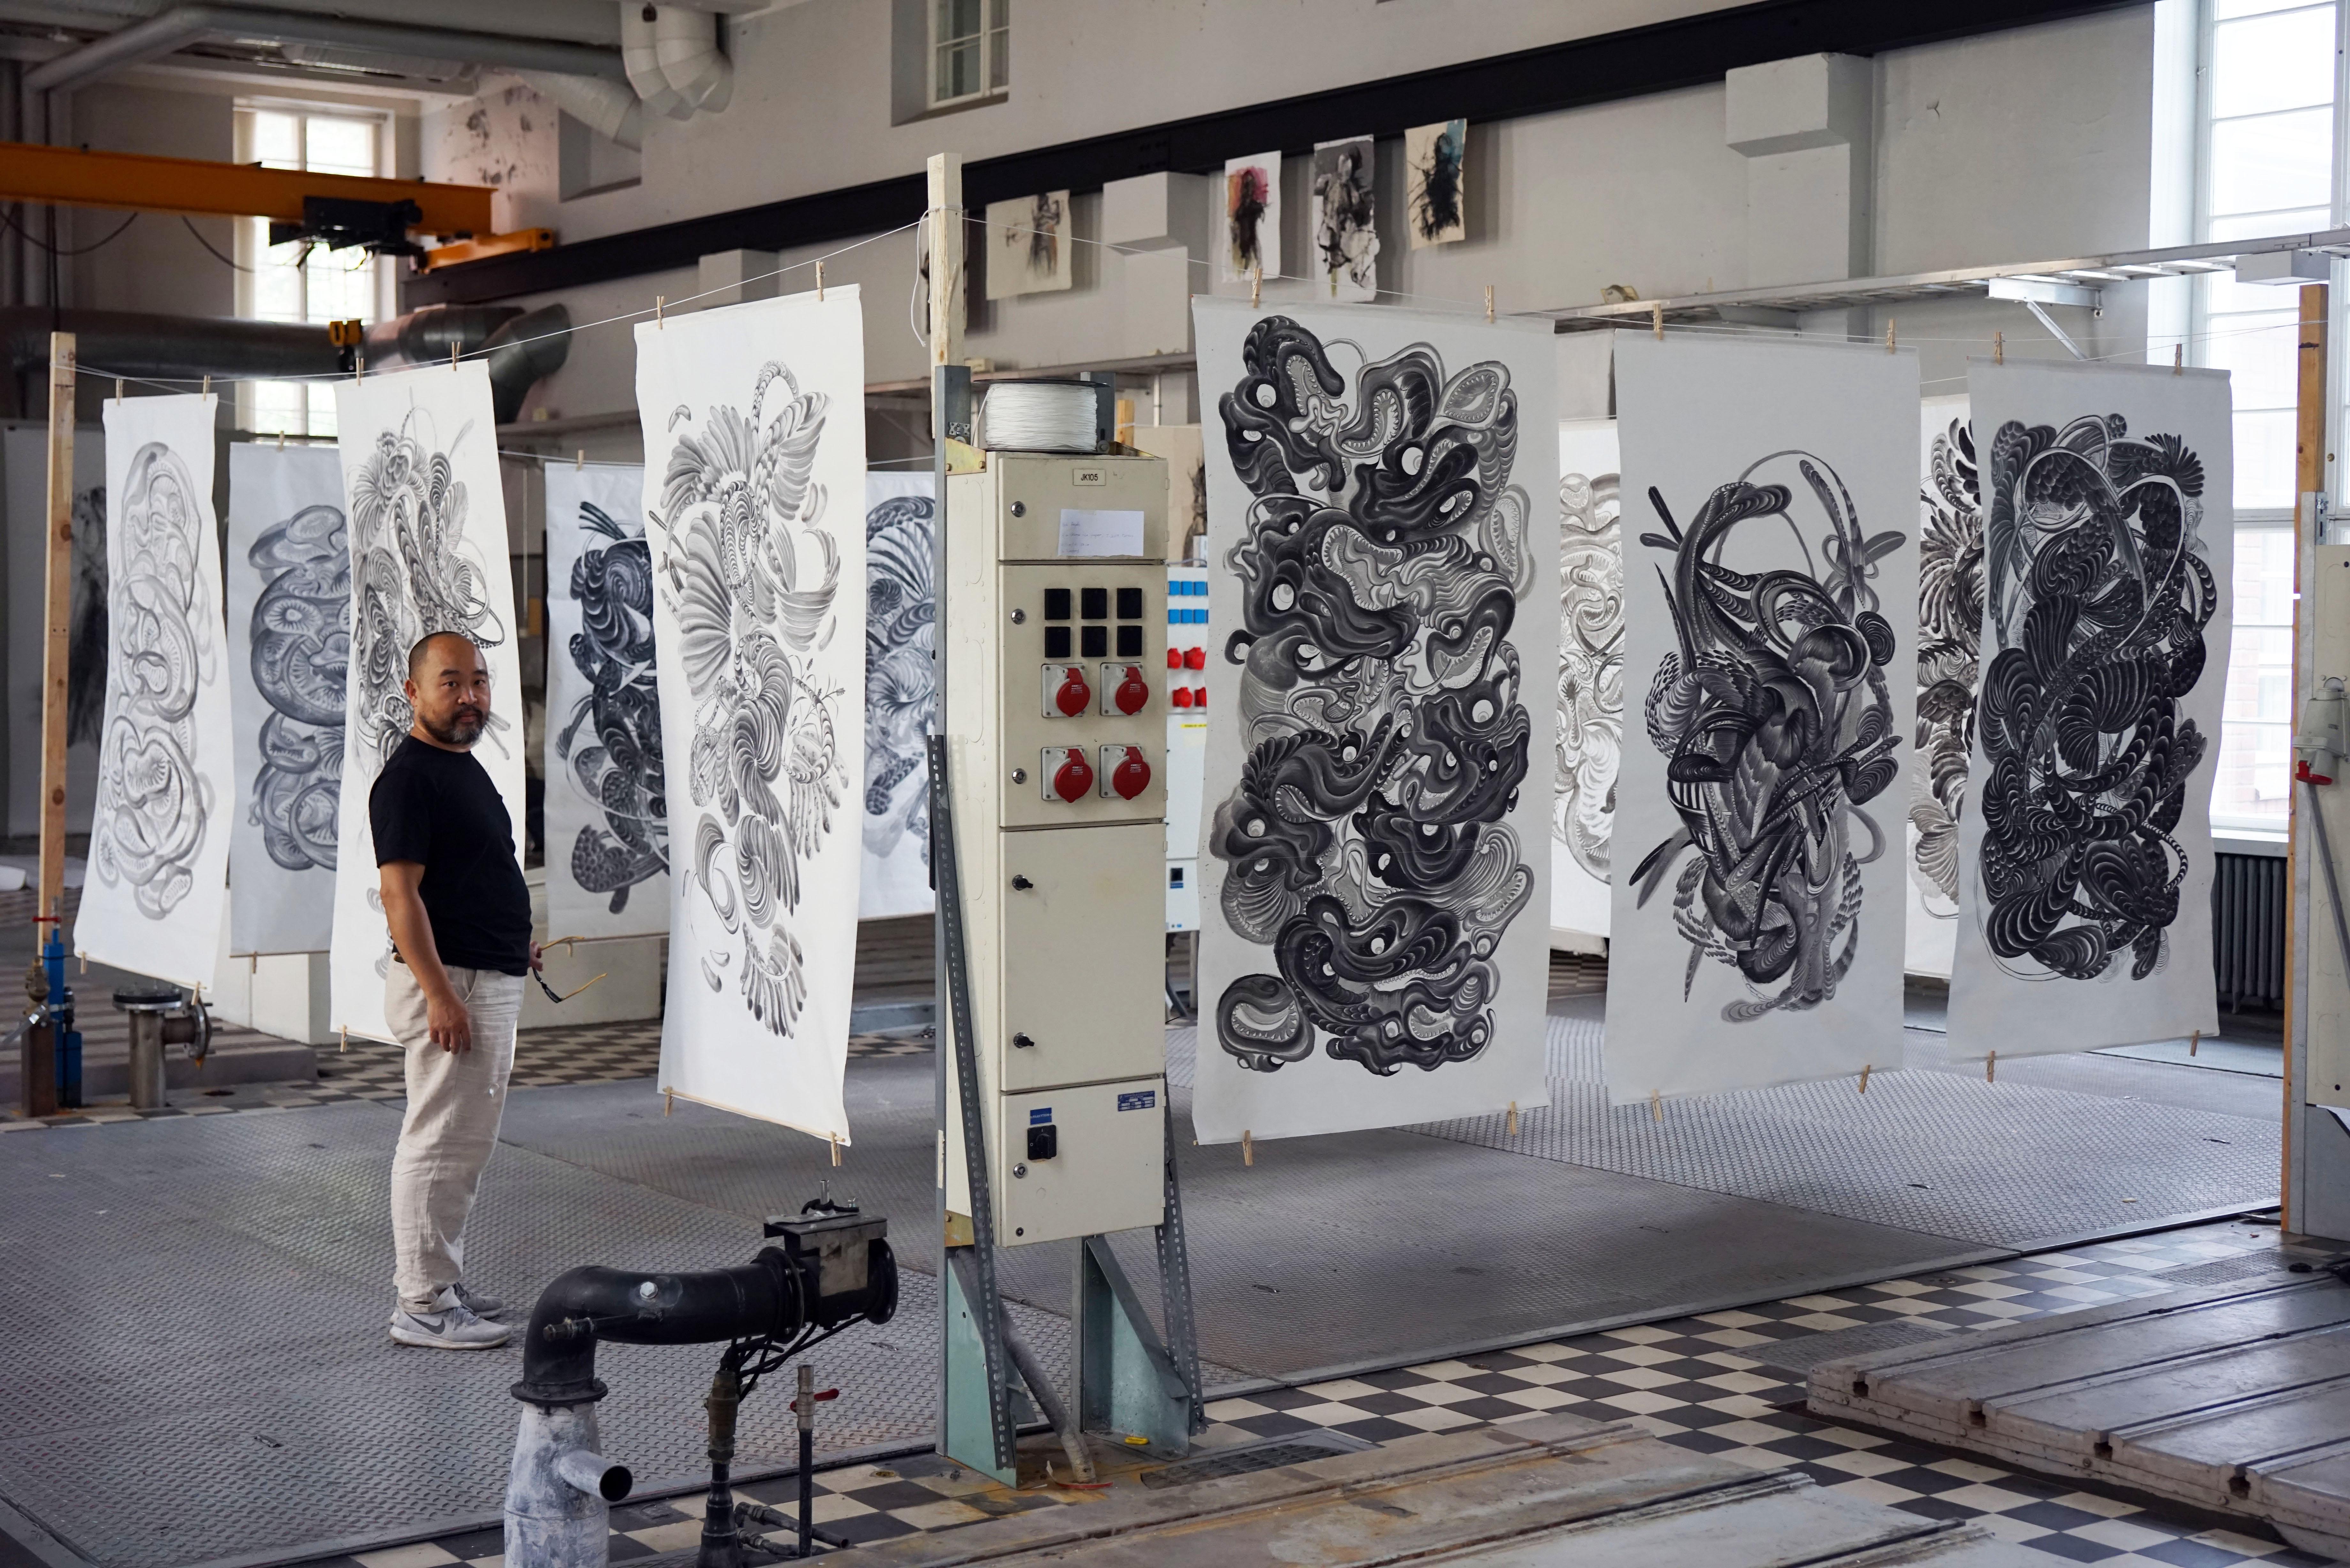 Pan Jian Feng and his work